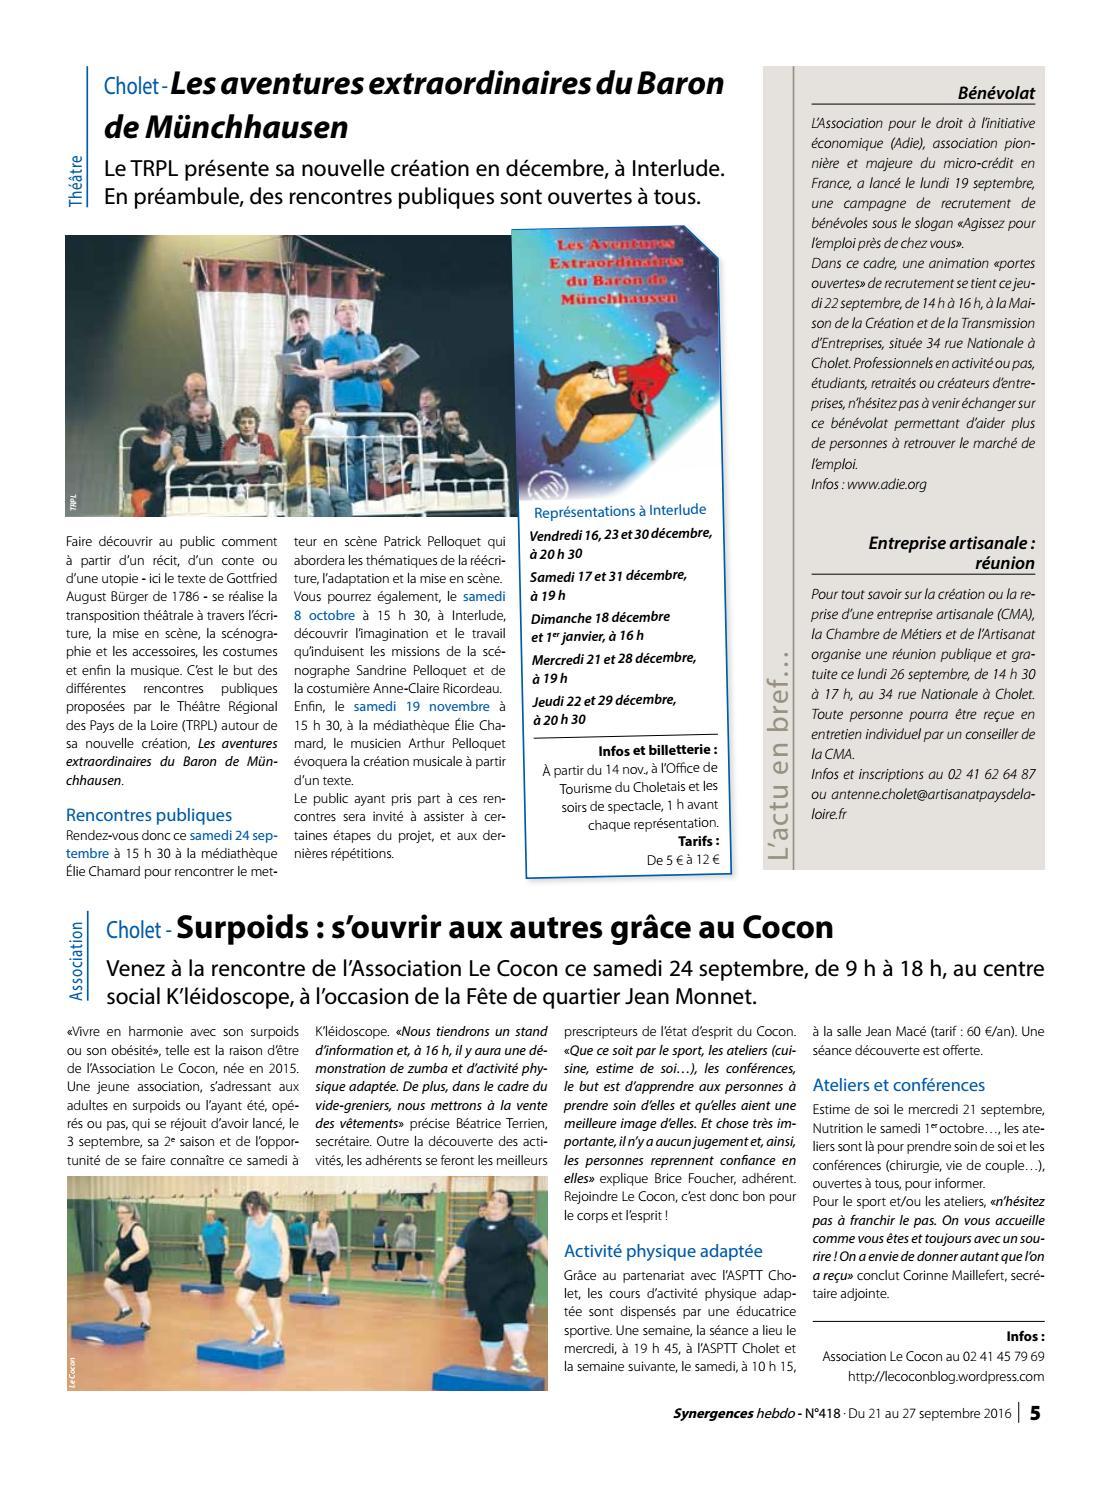 synergences hebdo n°418 by agglomération du choletais - issuu